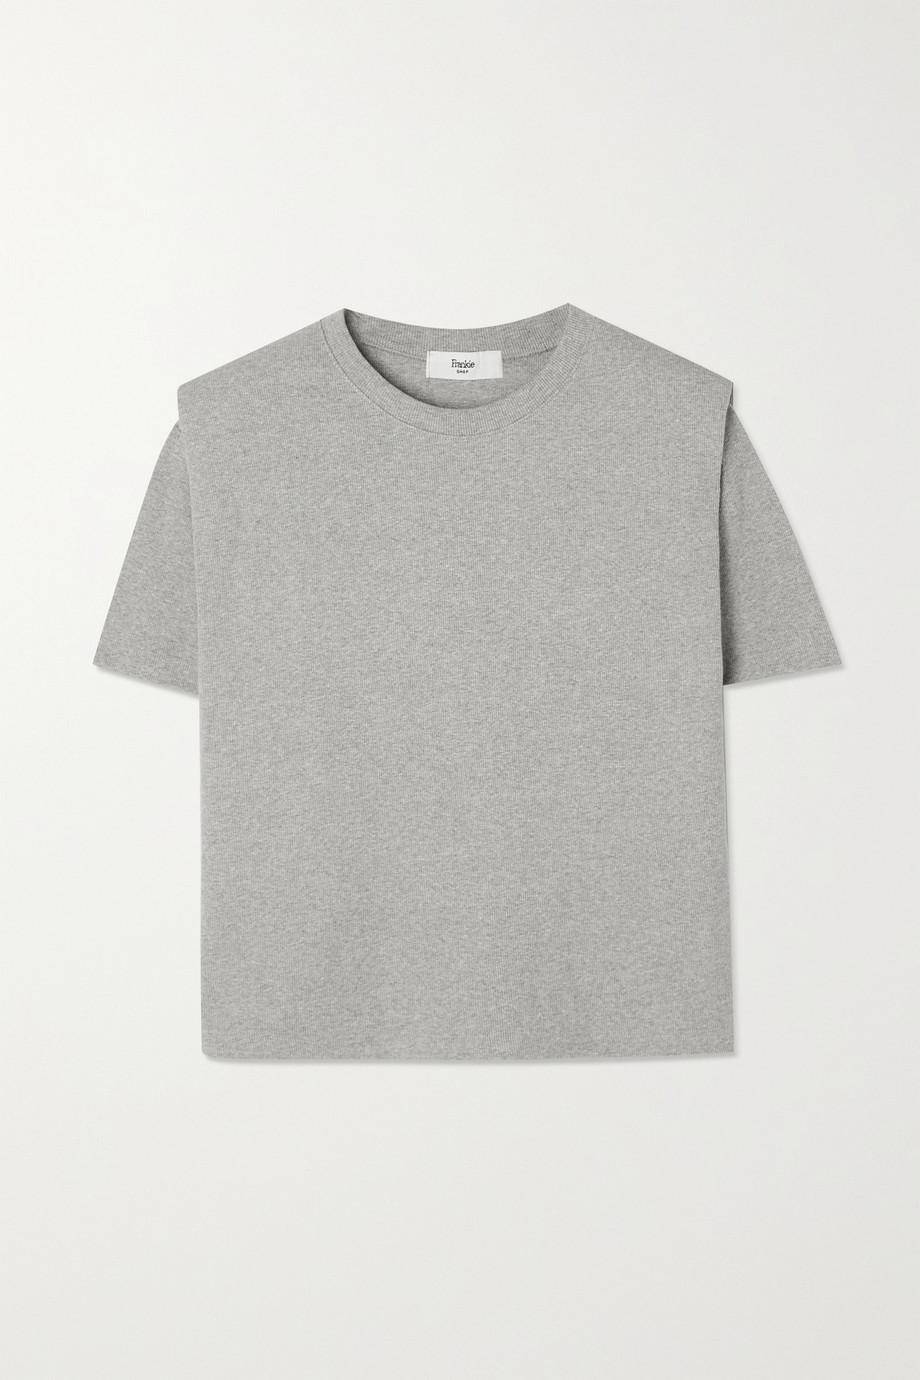 Frankie Shop Flora T-Shirt aus Baumwoll-Jersey